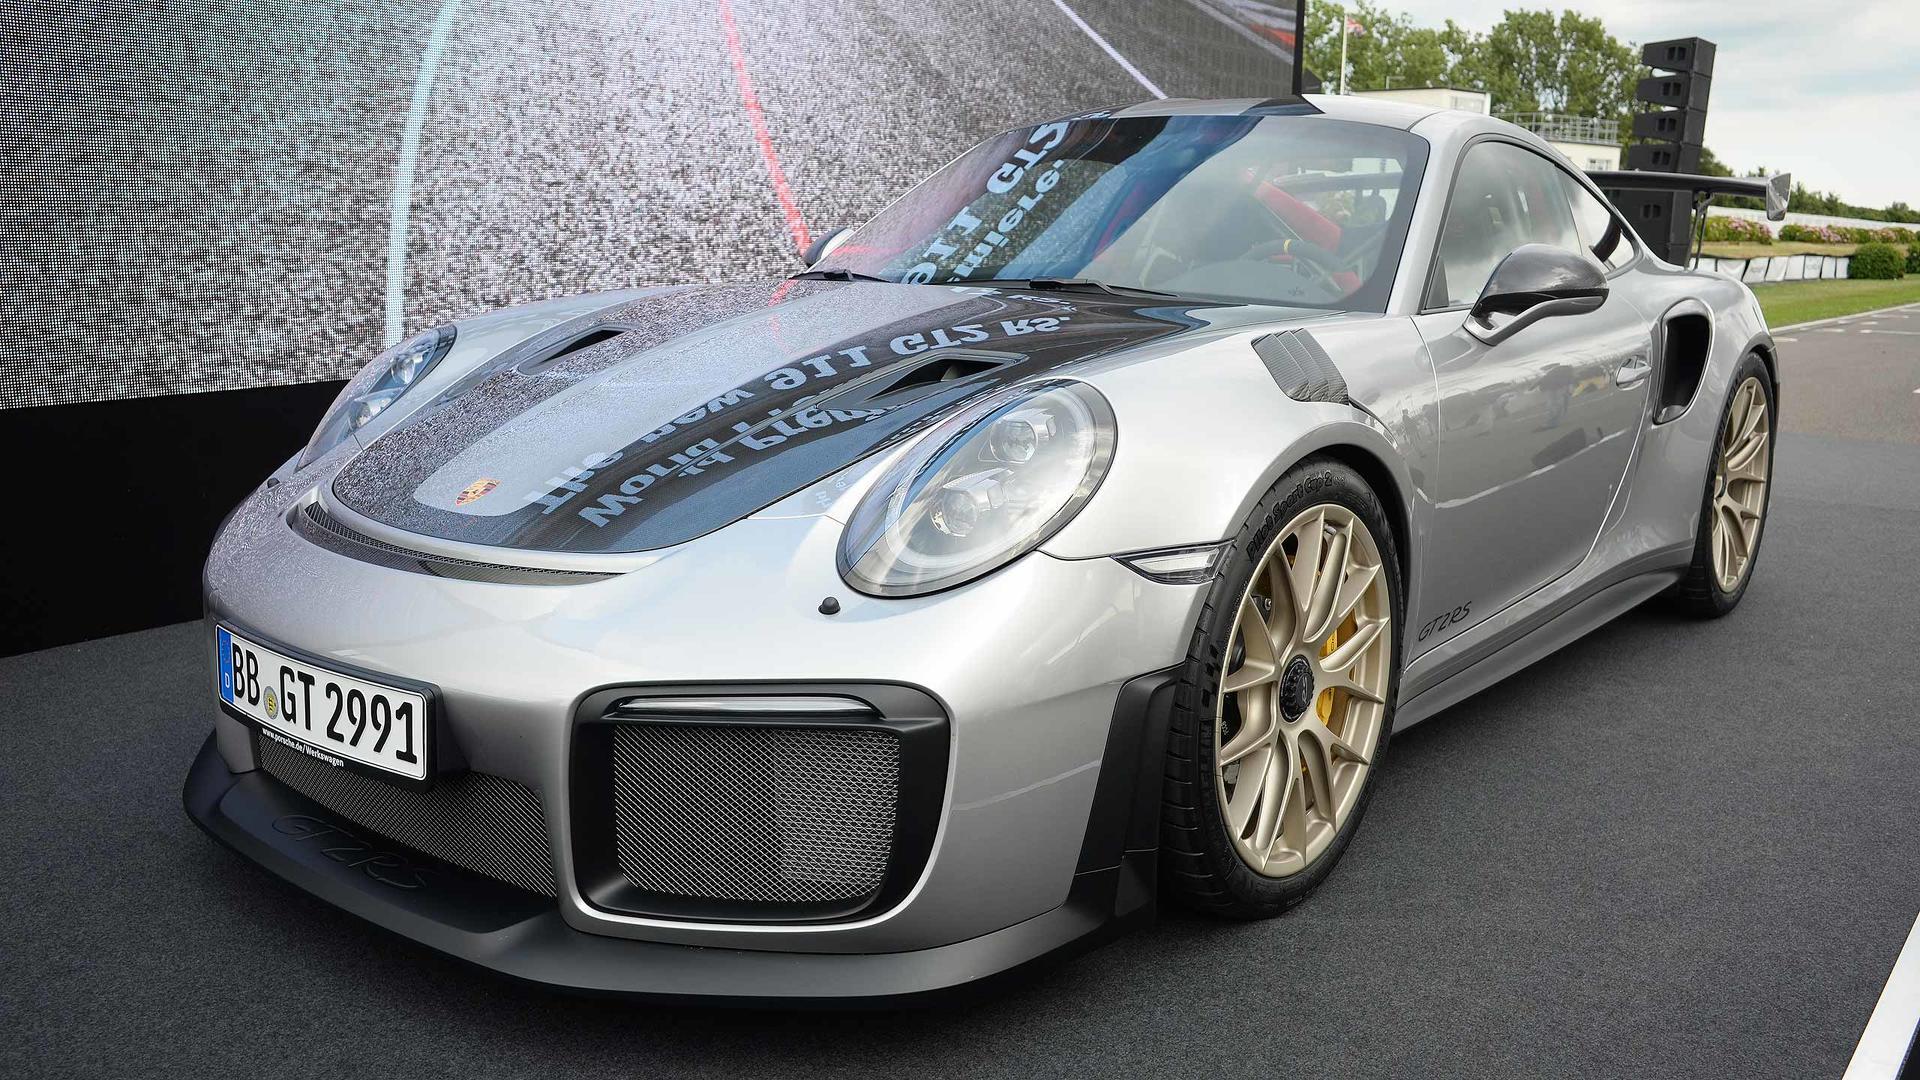 2018-porsche-911-gt2-rs-at-2017-goodwood-festival-of-speed Astounding Porsche 911 Gt2 for Sale Canada Cars Trend